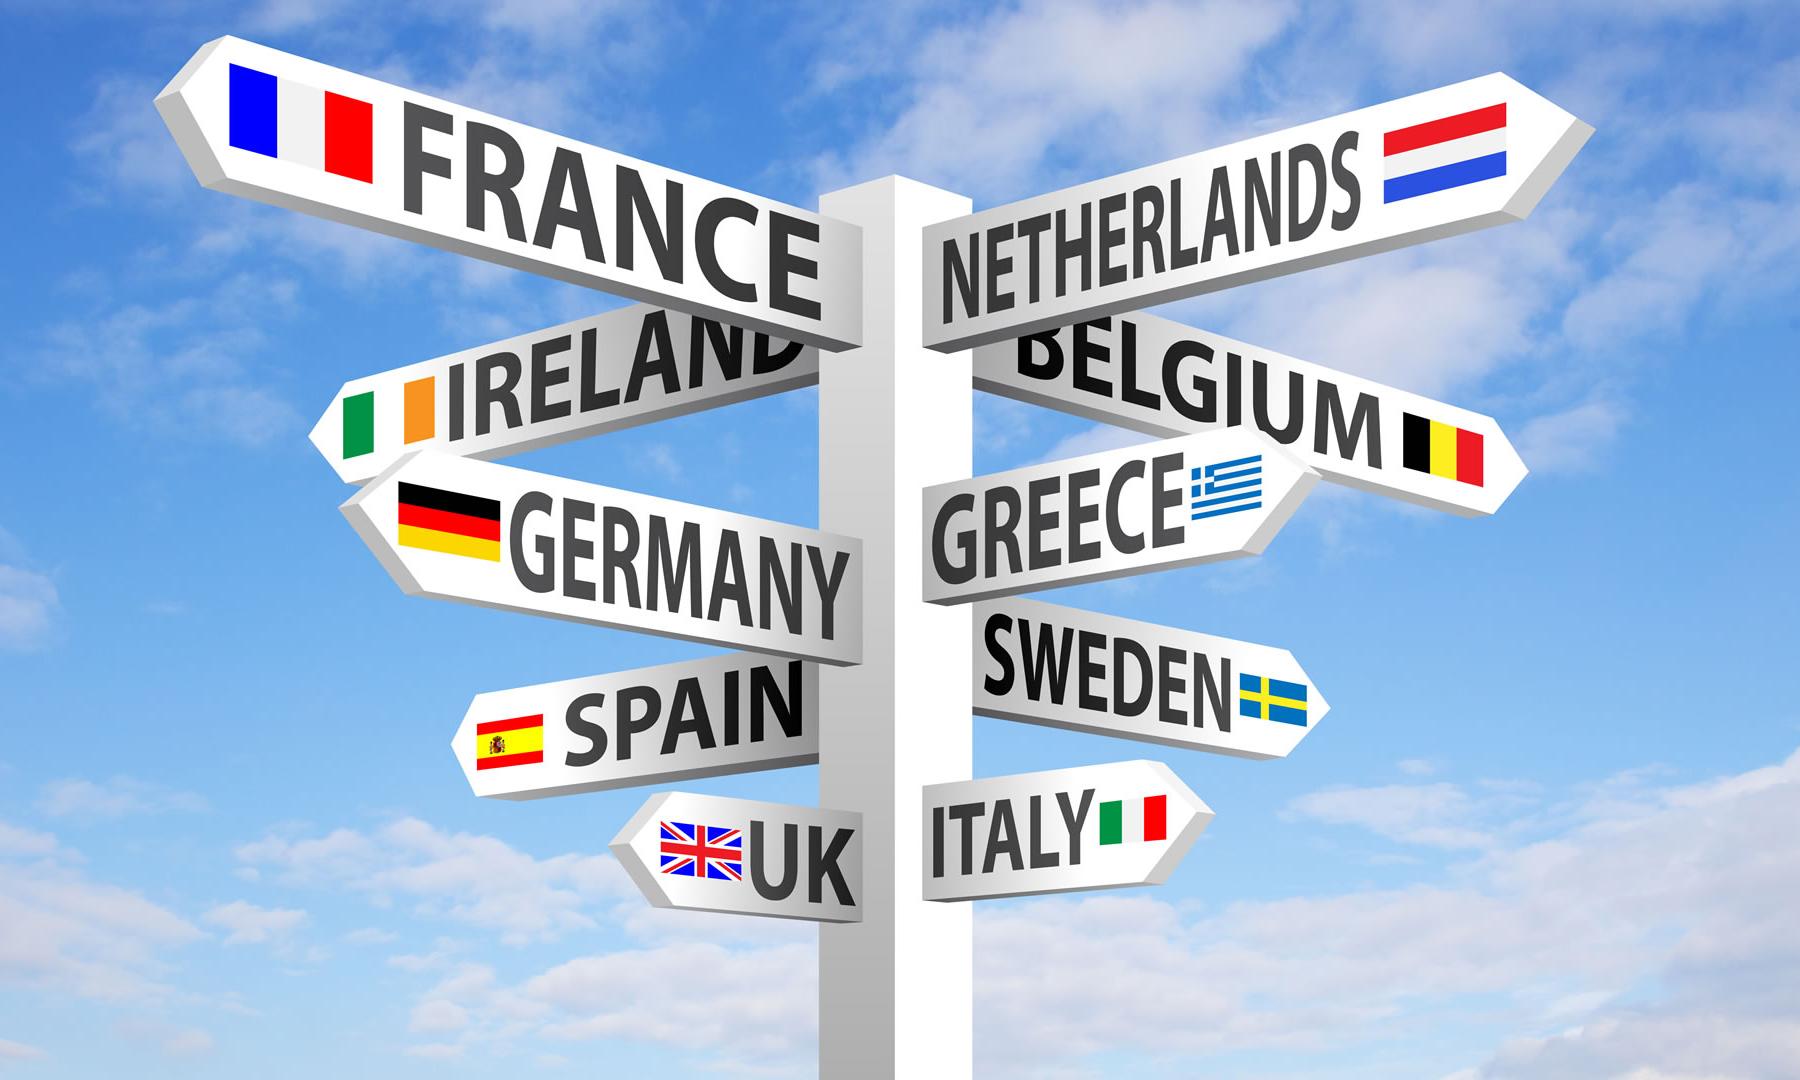 Brexit sparks concerns in students for Erasmus+ scheme